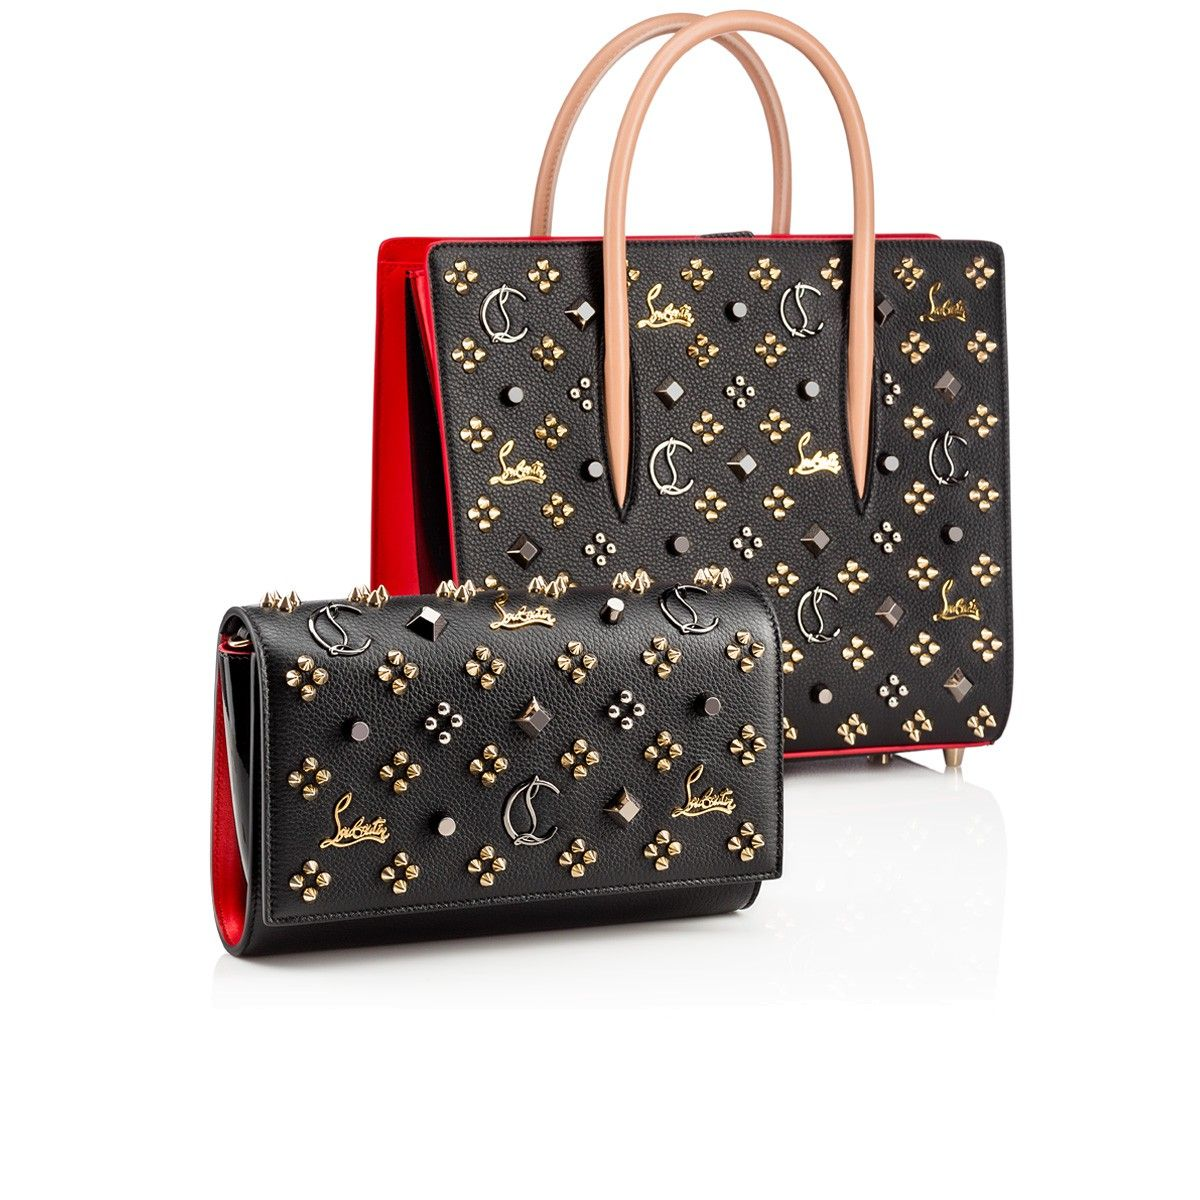 Paloma Clutch Black Calfskin - Handbags - Christian Louboutin